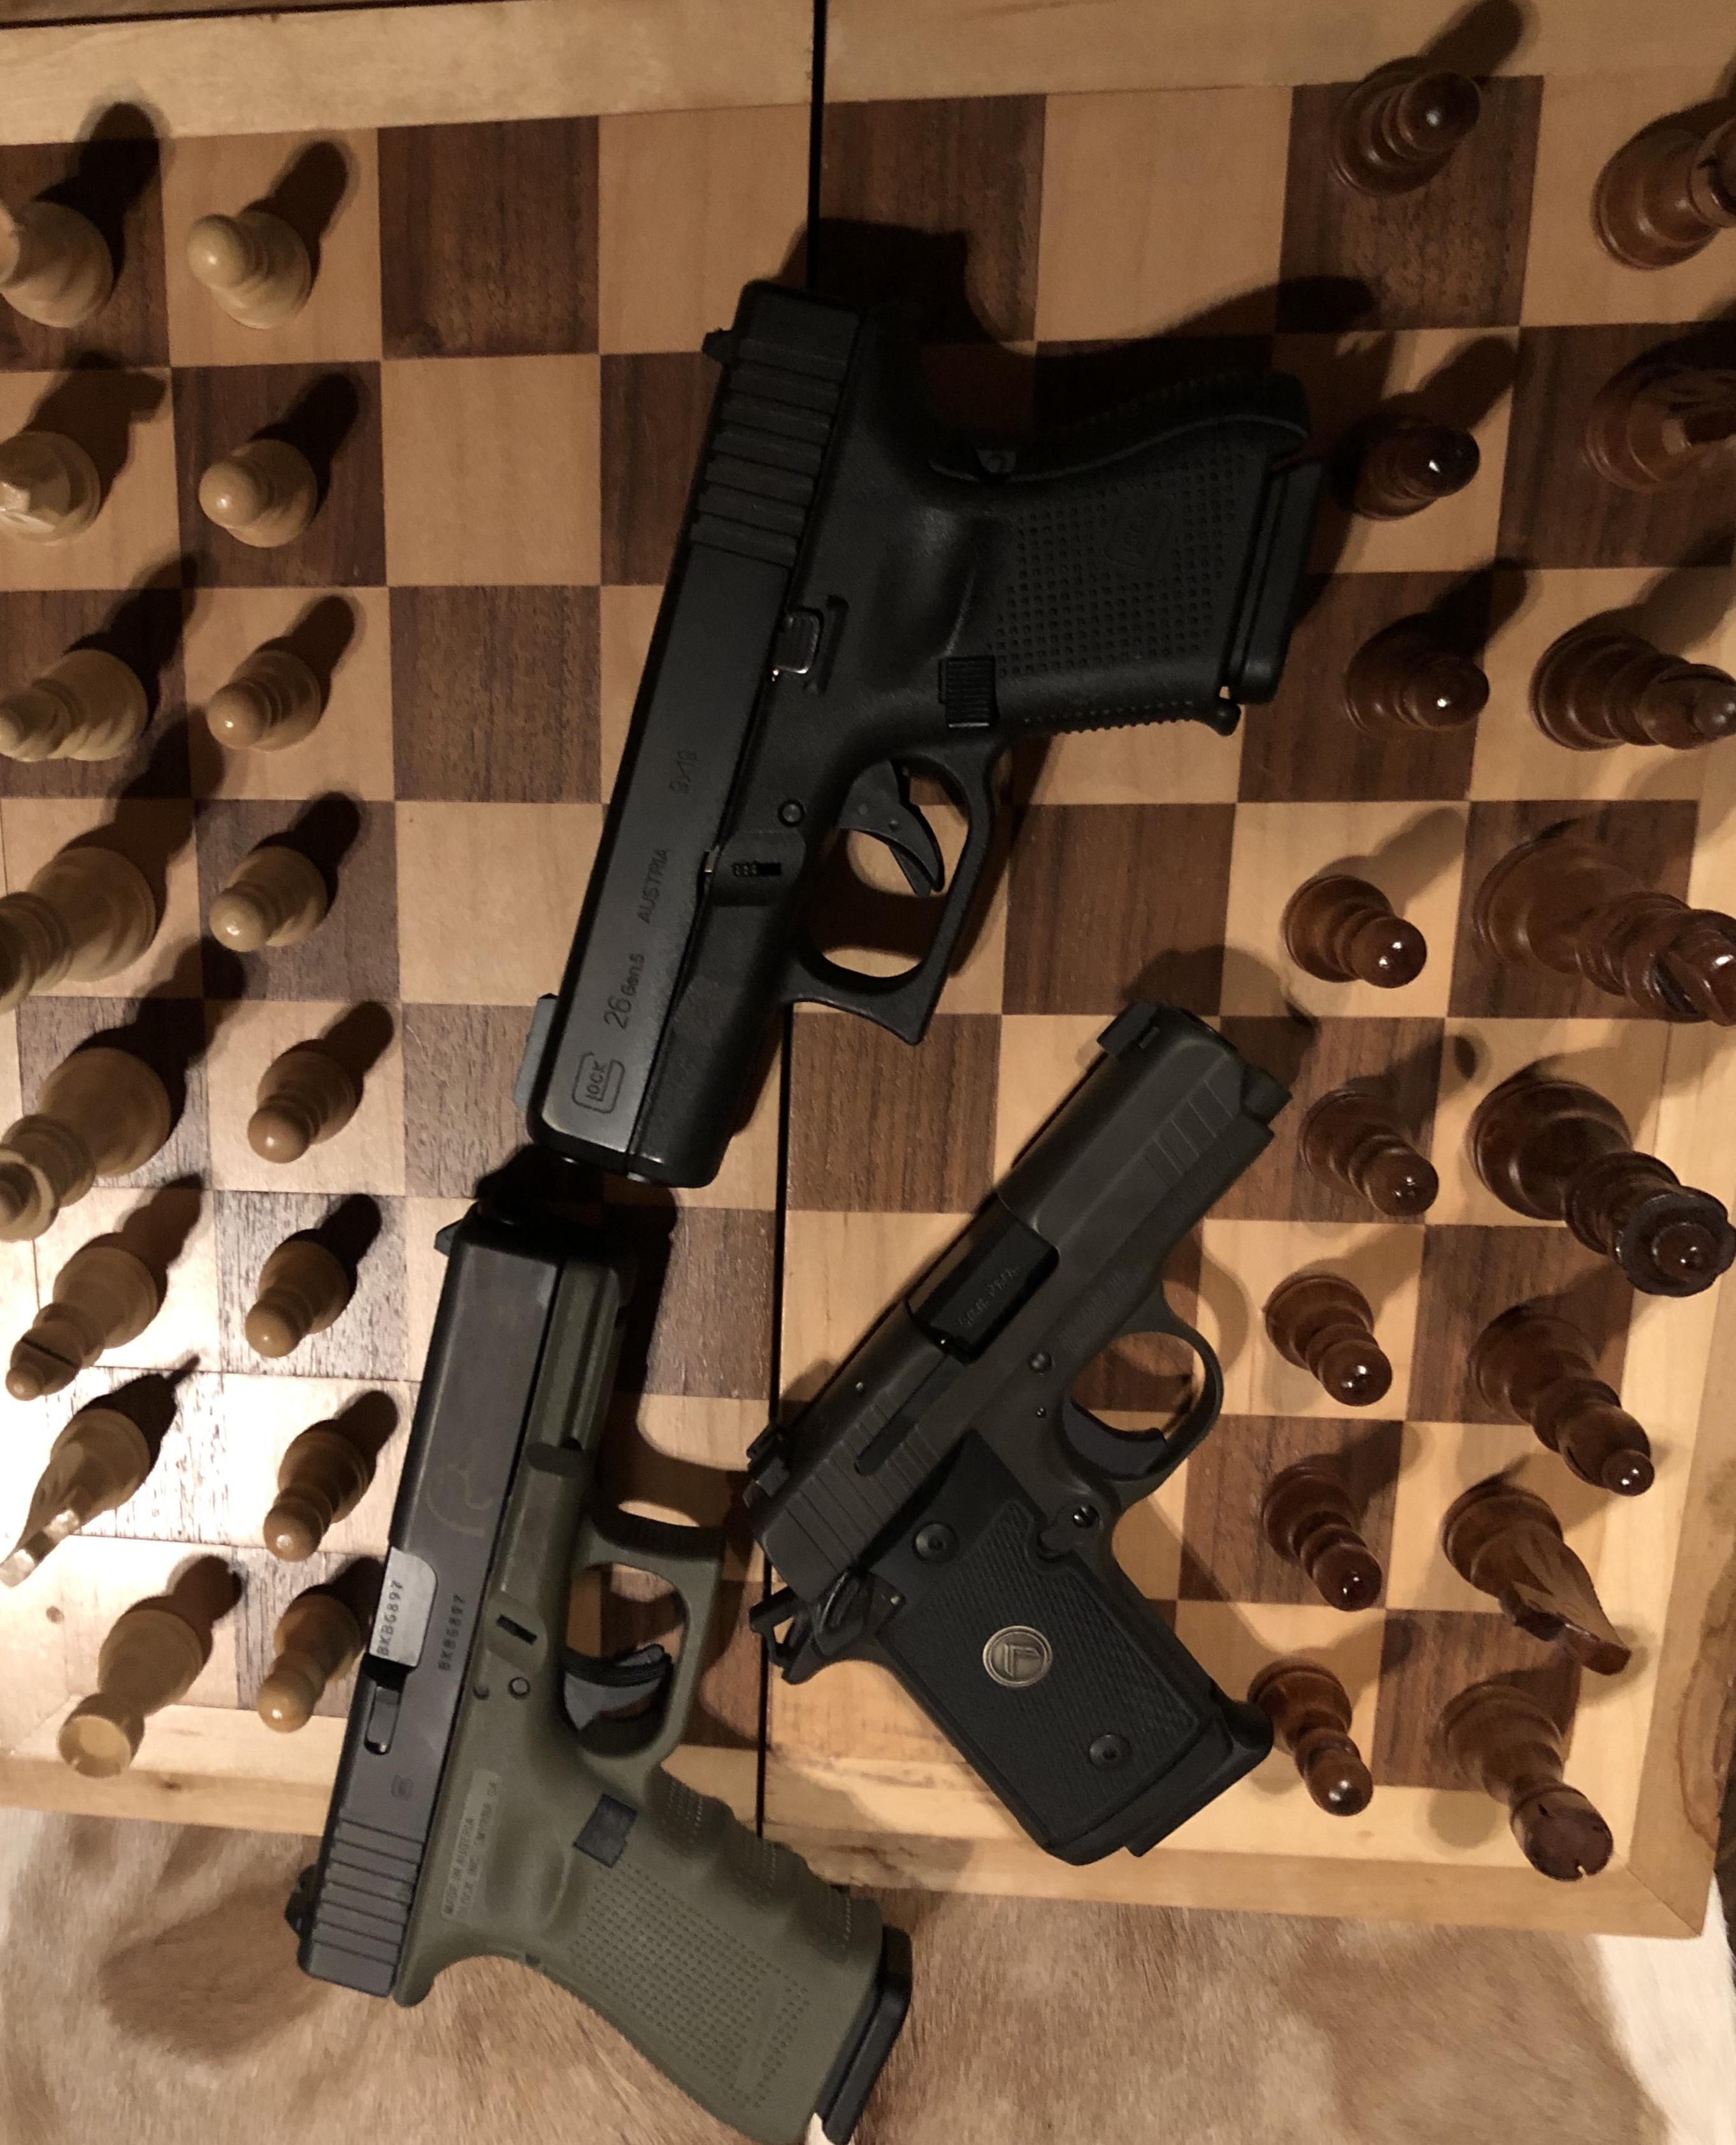 The 9mm Pistol Photo Thread-3ce8ed7f-549d-4373-9ecf-48ff6df8912d.jpeg